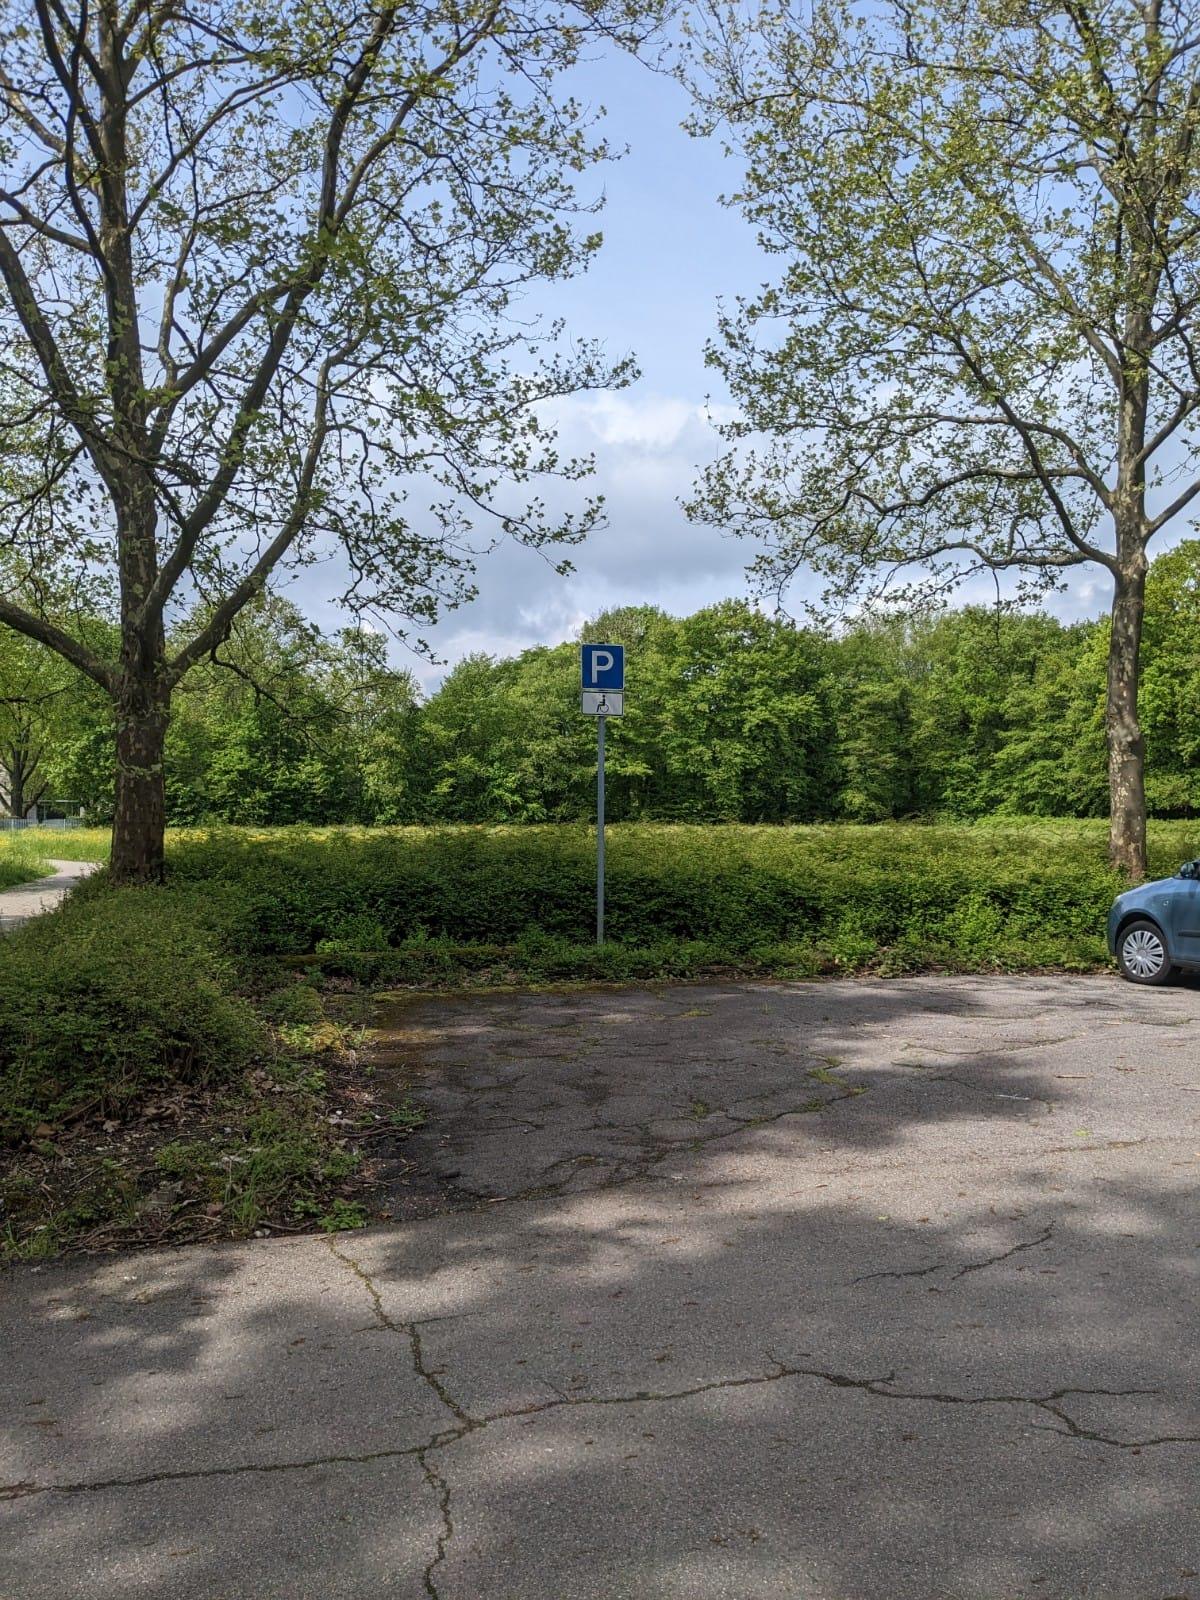 6 Behindertenparkplätze beim Friedhof Römerschanze